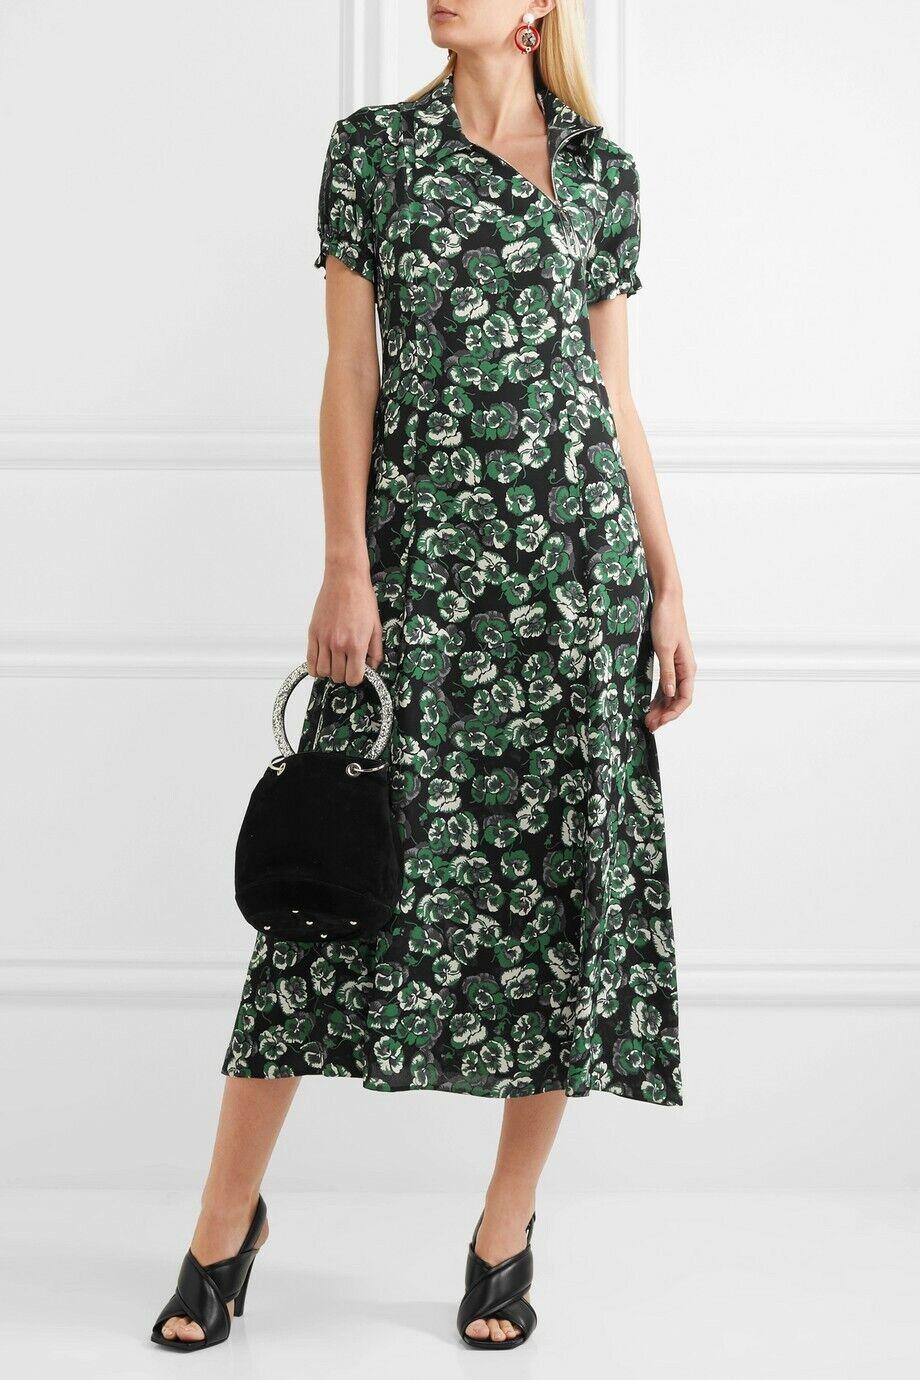 NWT MARNI Floral-print crepe zipper front midi dress Size 44